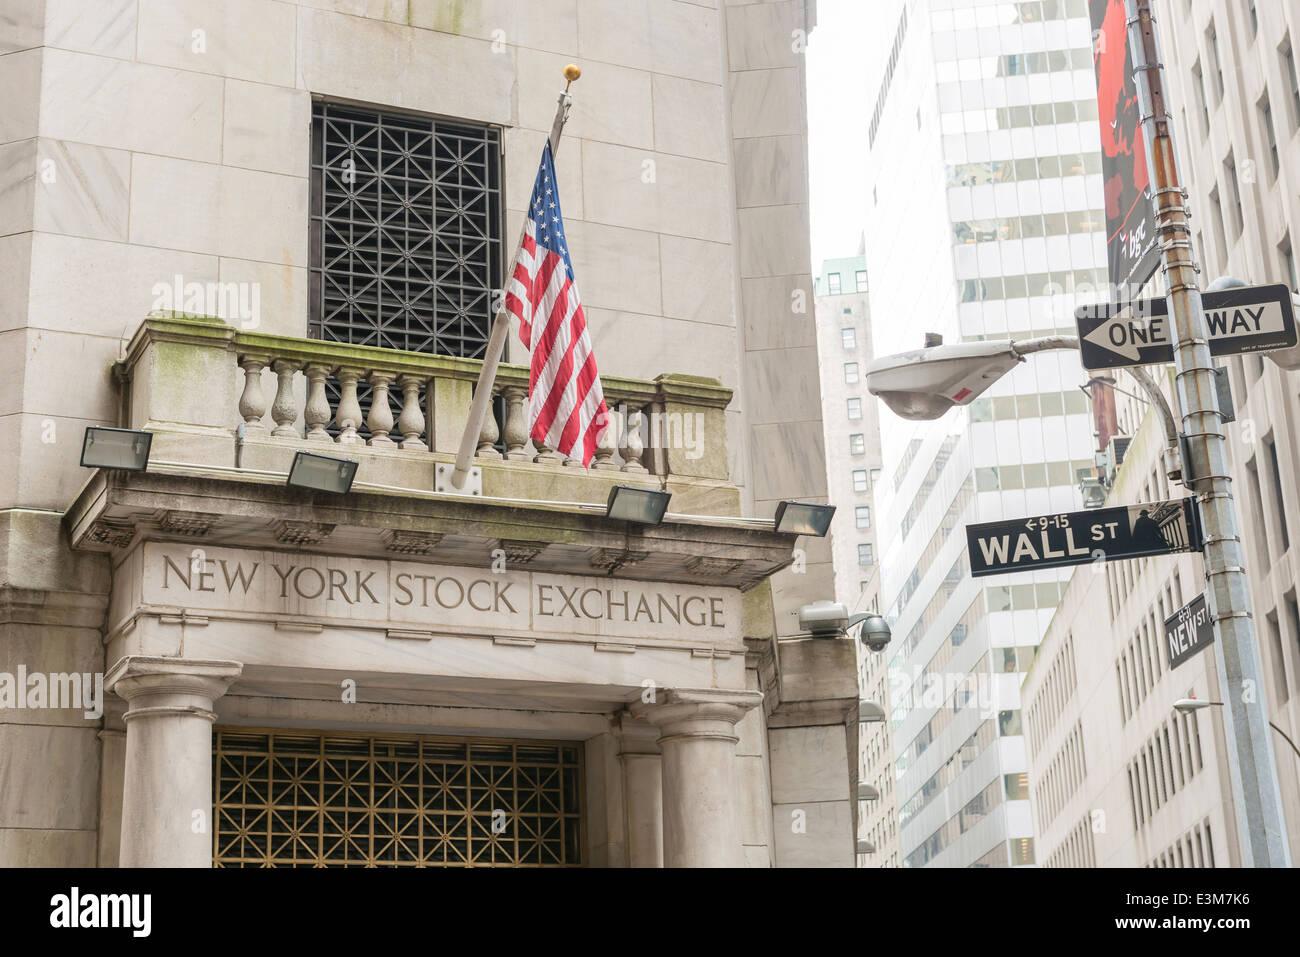 Wall Street signe à la Bourse de New York, New York USA Photo Stock